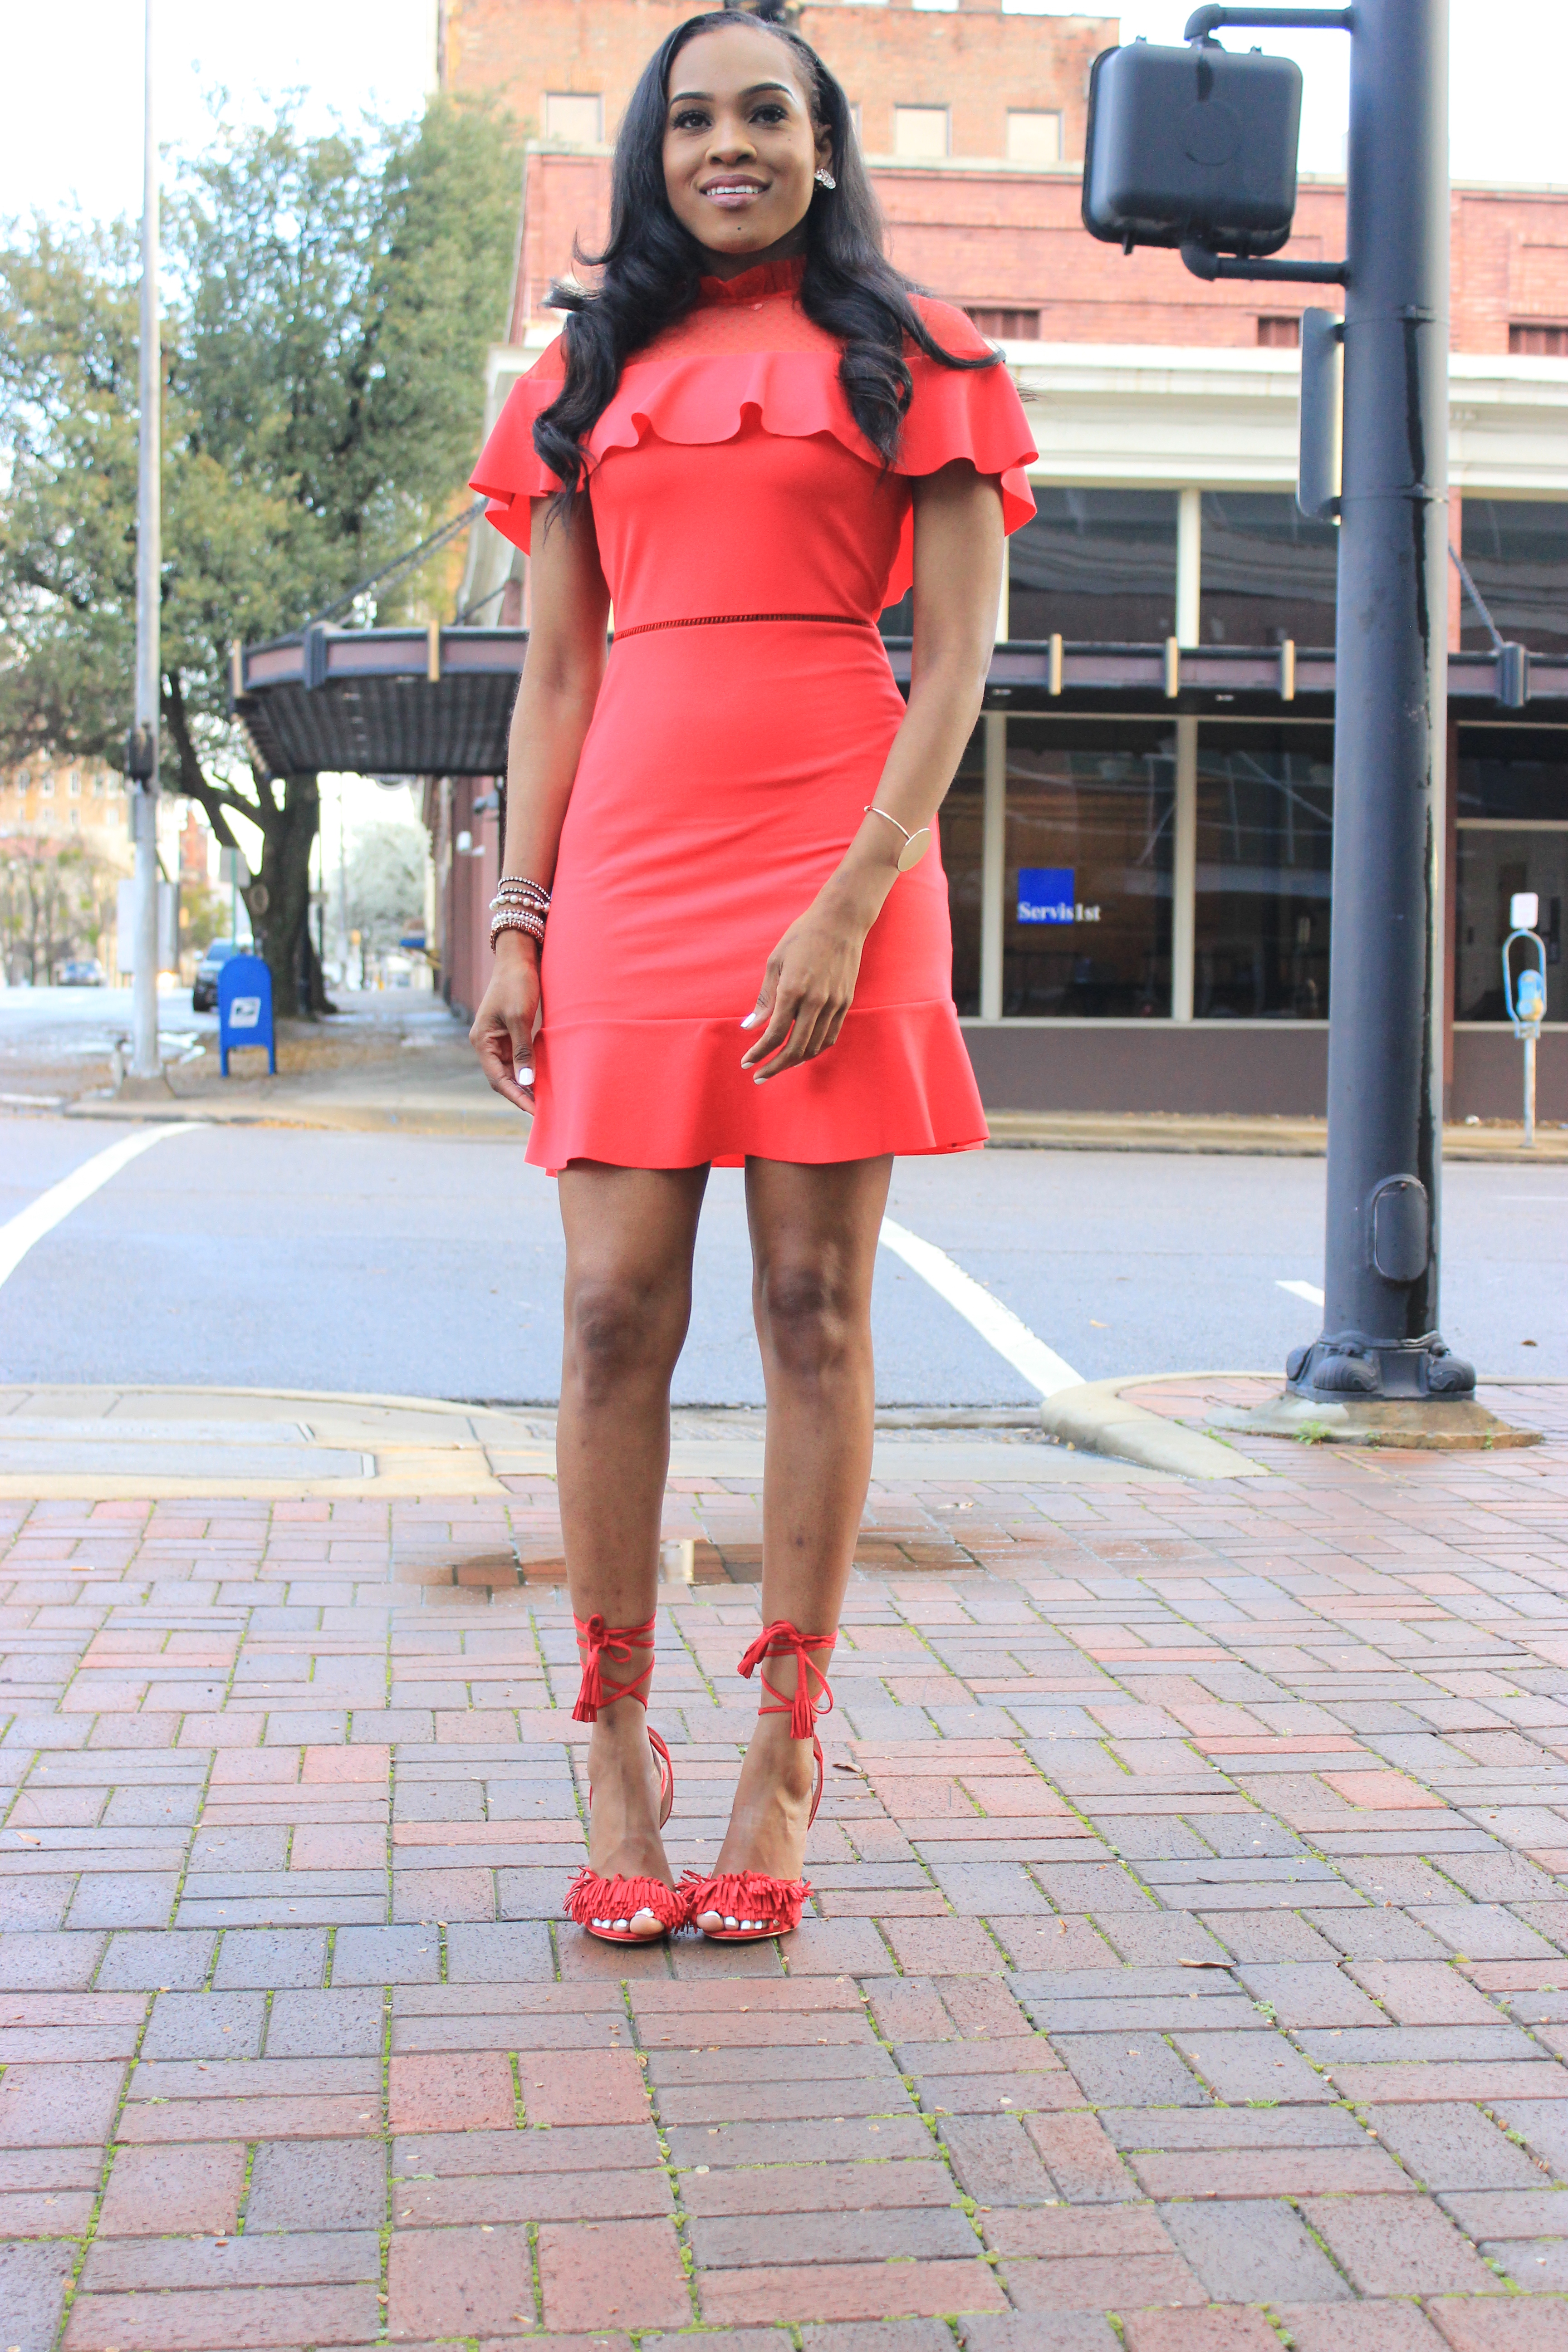 Style-files-Asos-Skater-Dress-with-Dobby-mesh-panel-red-skater-dress-asos-red-skater-dress-red-fringe-justfab-heels-justfab-red-tayrey-heel-sandals-oohlalablog-10